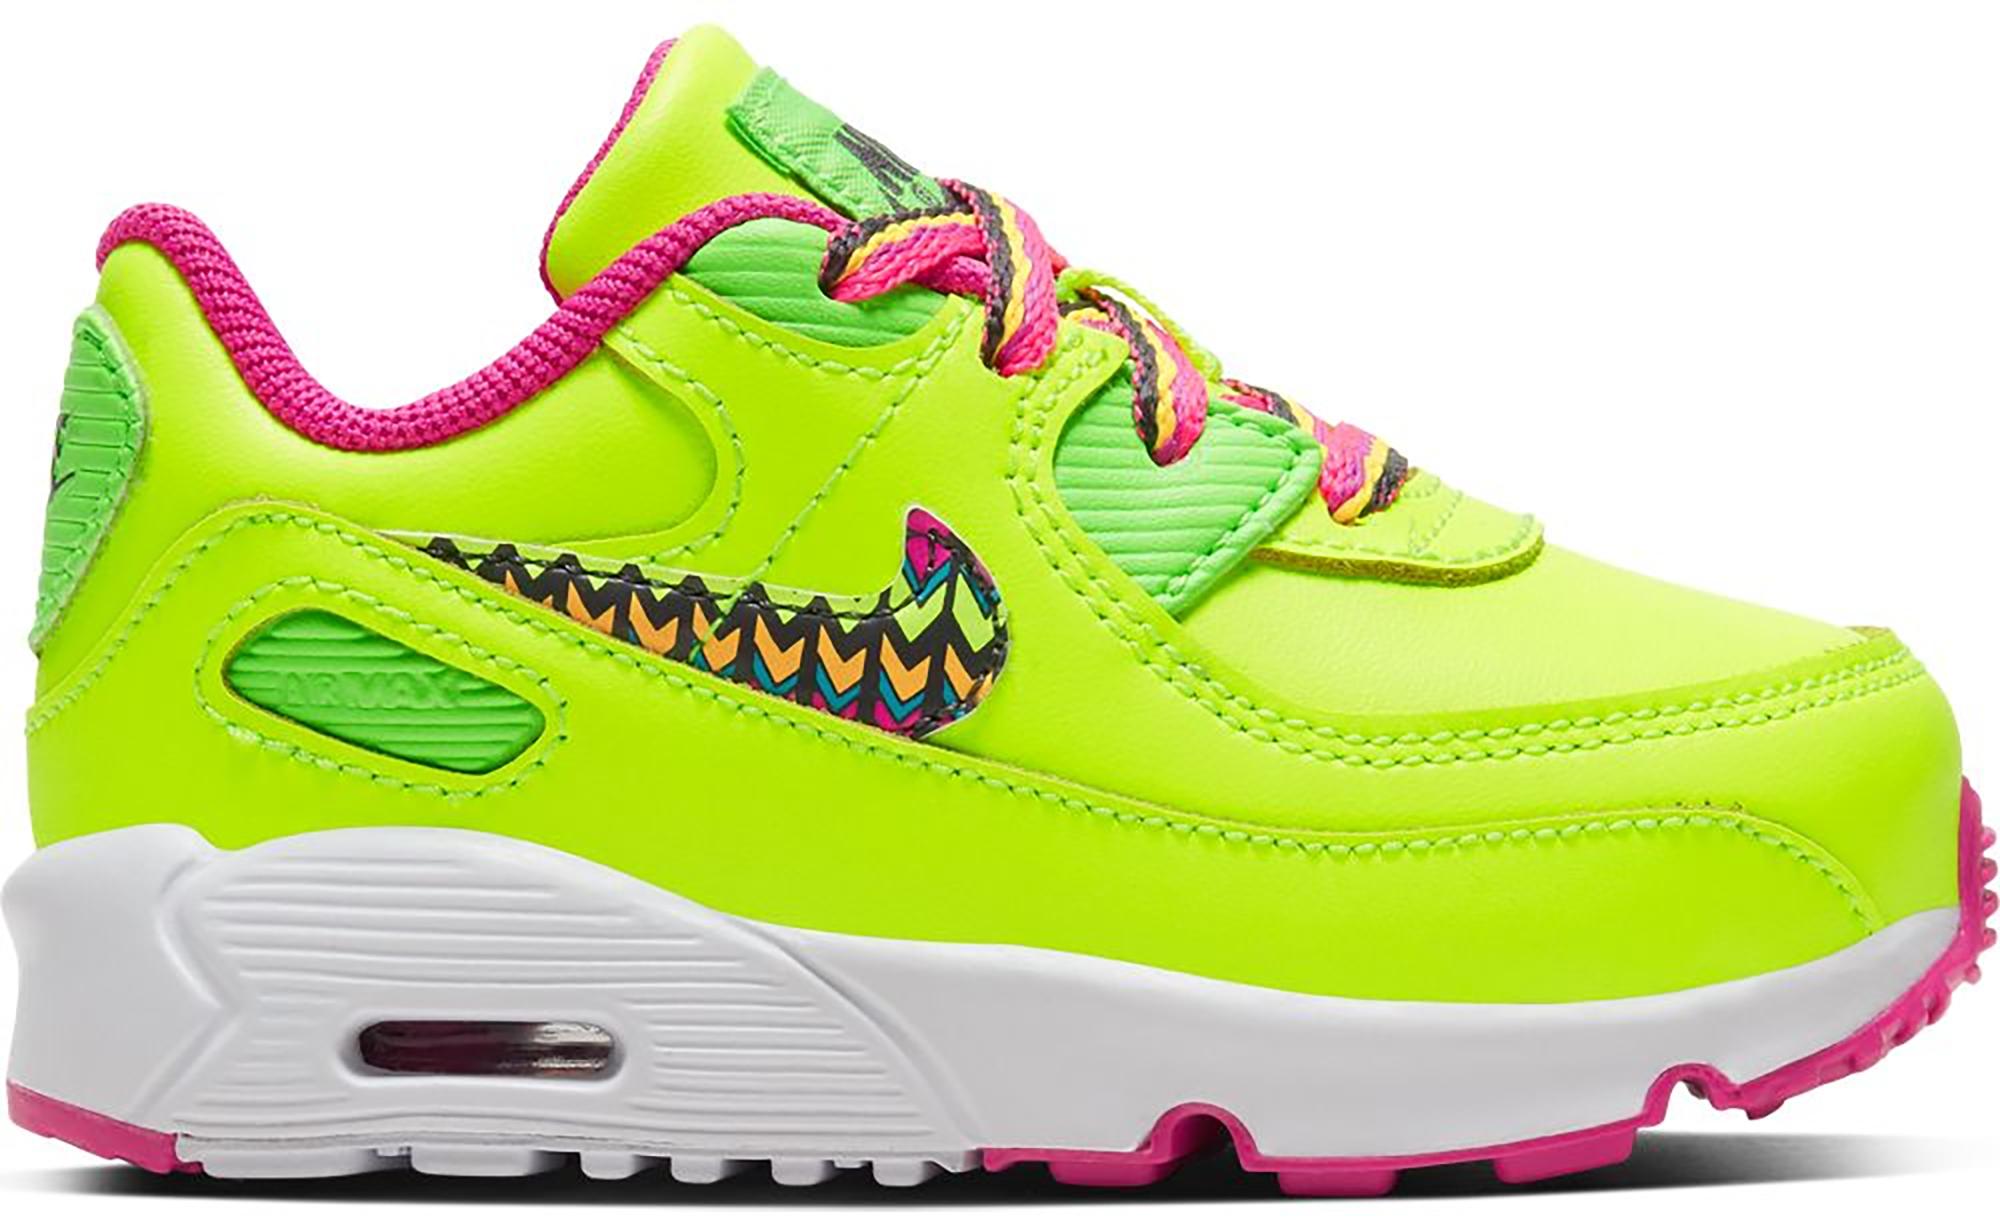 Nike Air Max 90 Volt Fire Pink Green